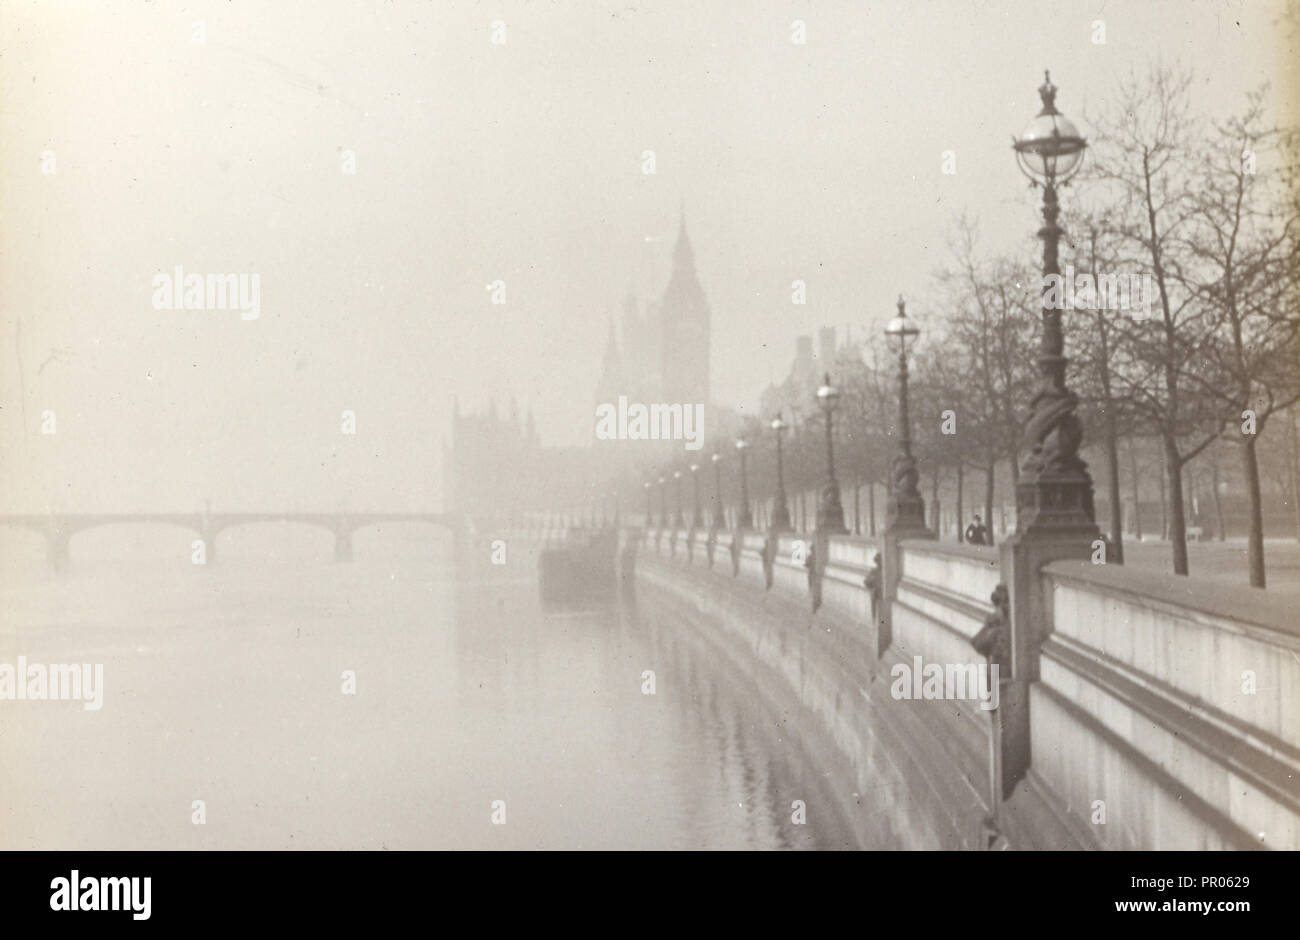 London. Embankment; Frederick H. Evans, British, 1853 - 1943, 1908; Lantern slide; 4.2 x 6.4 cm 1 11,16 x 2 9,16 in - Stock Image